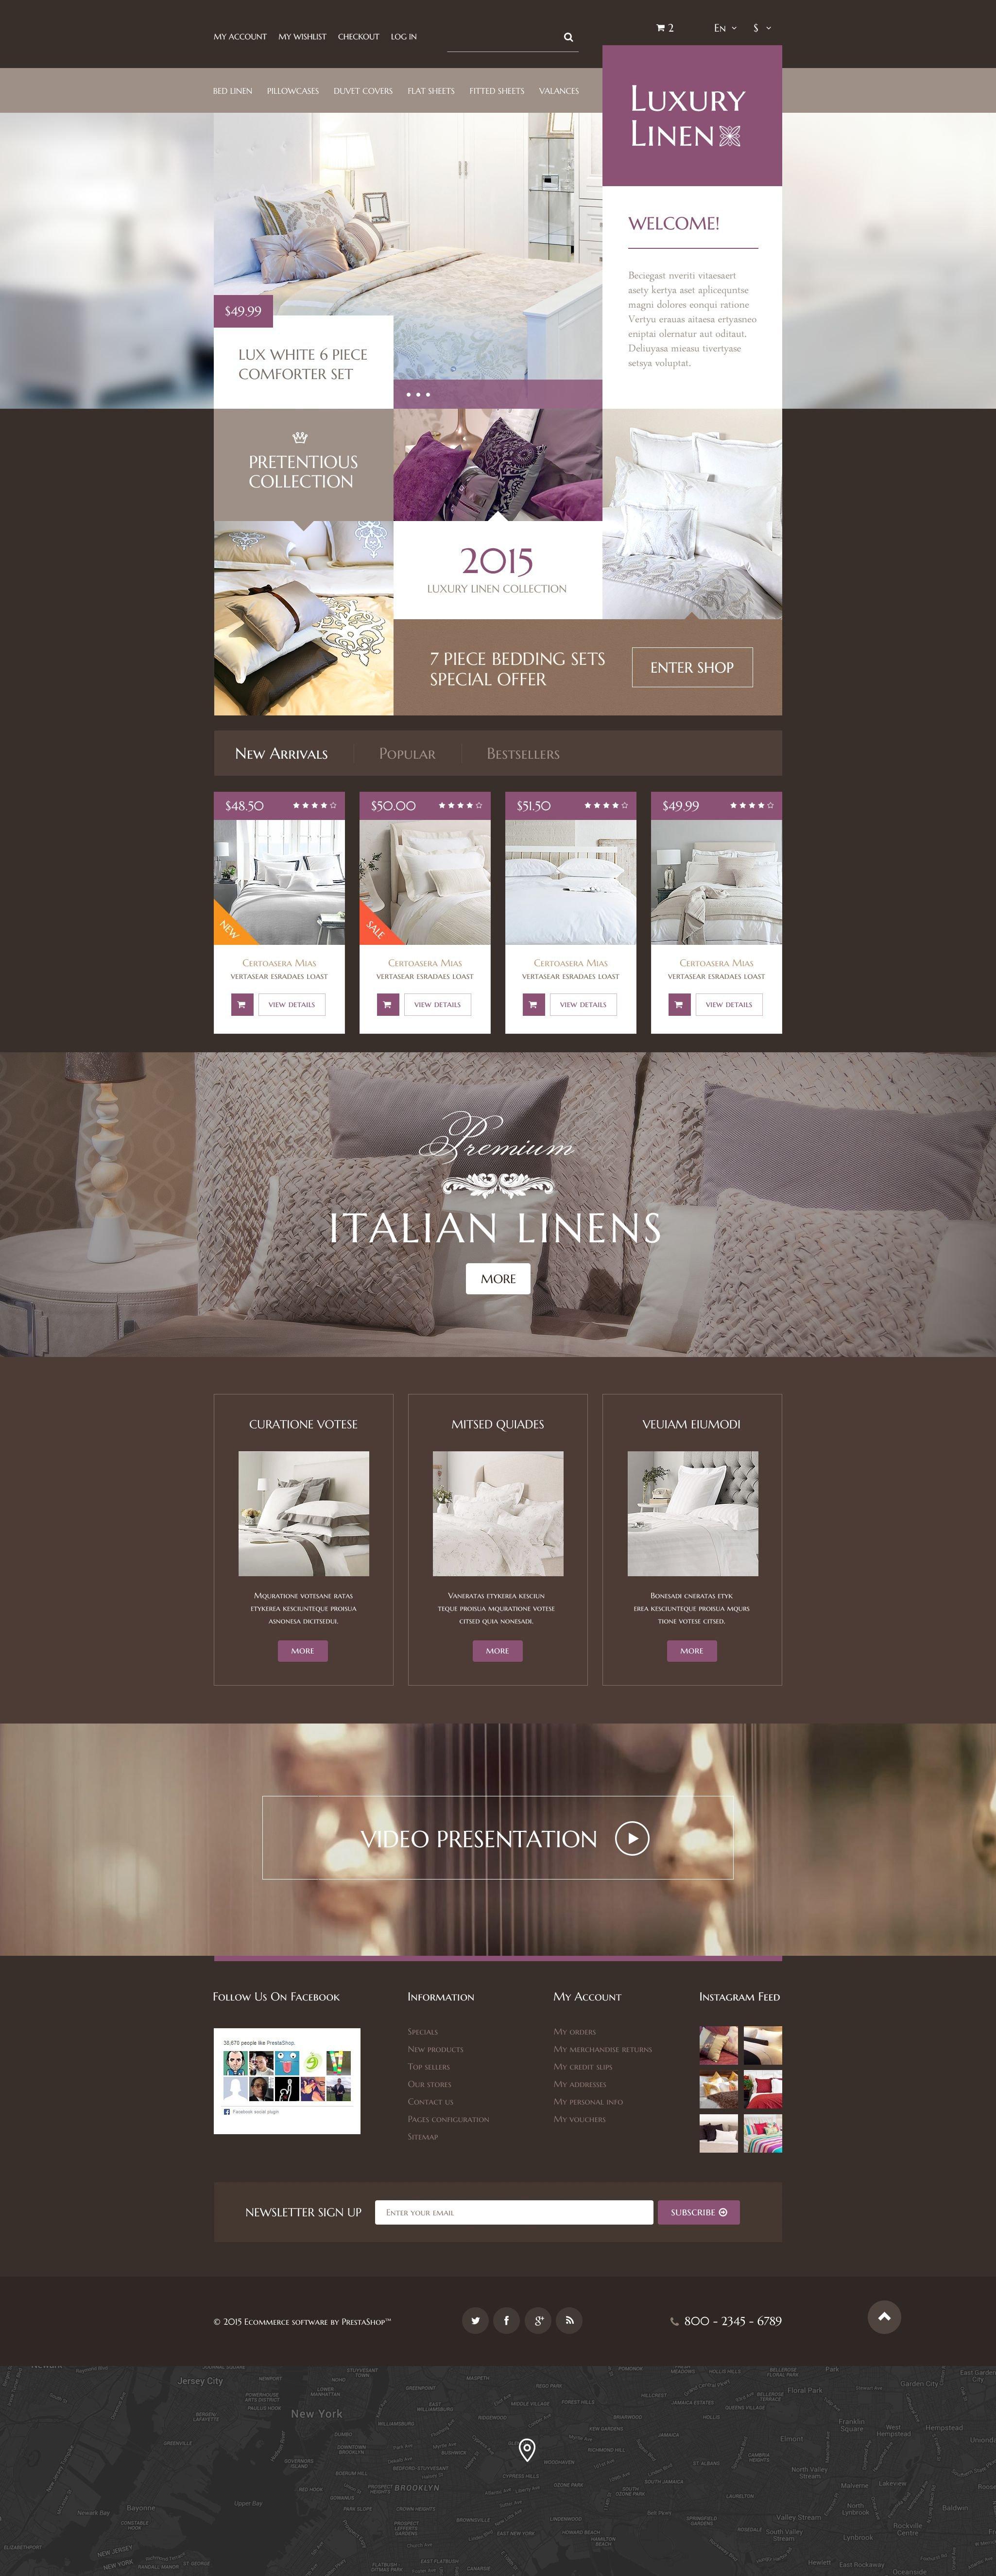 Luxury Linen Store PrestaShop Theme - screenshot